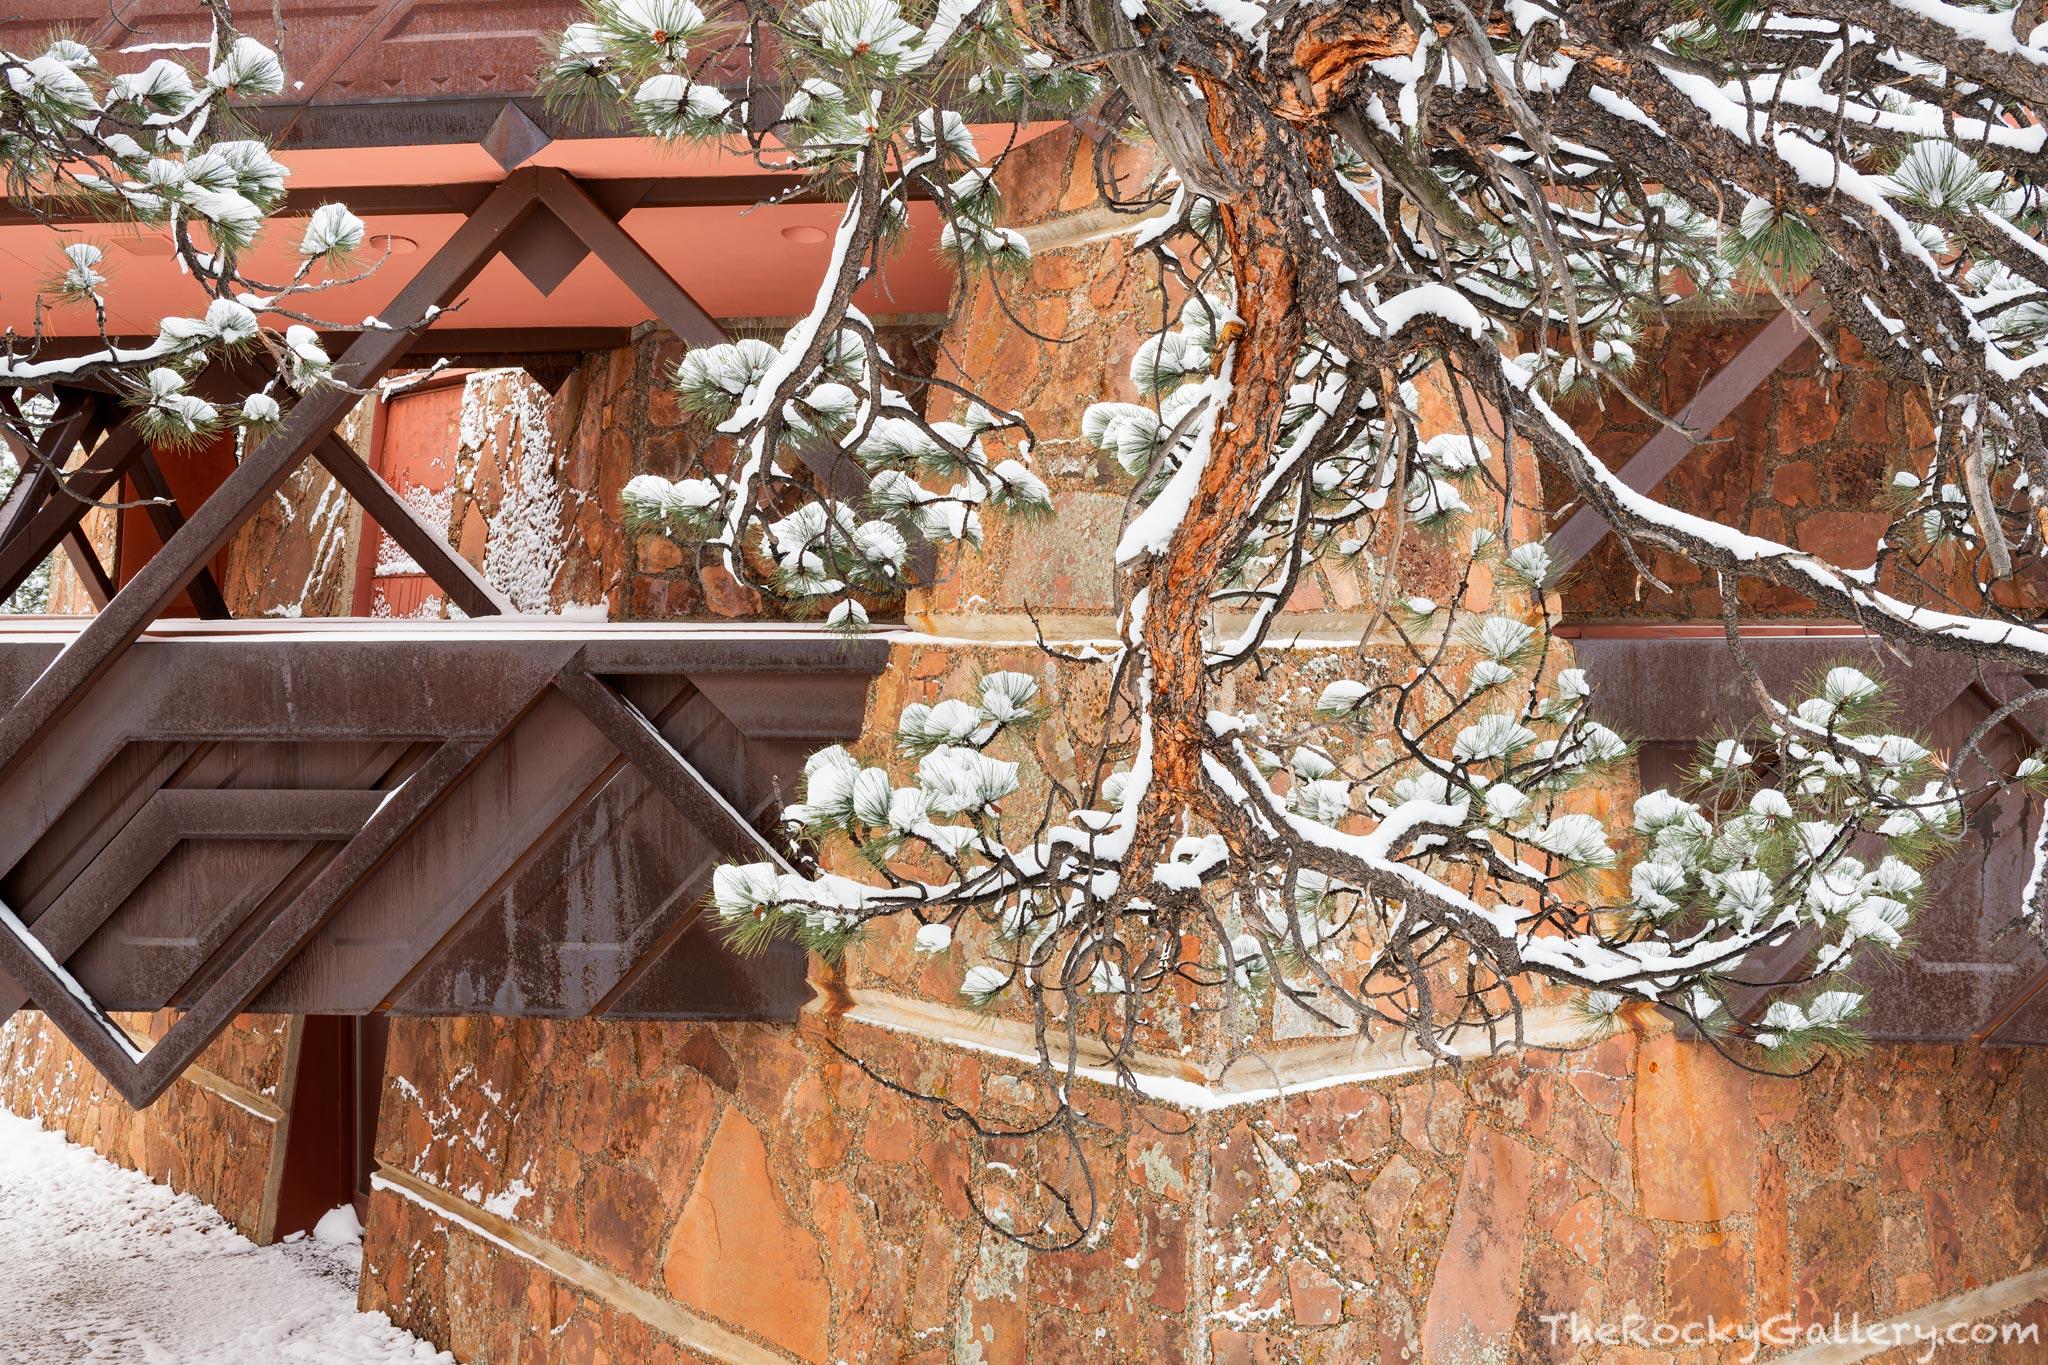 Frank Lloyd Wright,Taliesin Associated Architects,Beaver Meadows Visitor Center,RMNP,Rocky Mountain National Park,Colorado,NPS,National Park Service,Estes Park,Trail Ridge Road,Entrance,Snow,Winter,Ap, photo